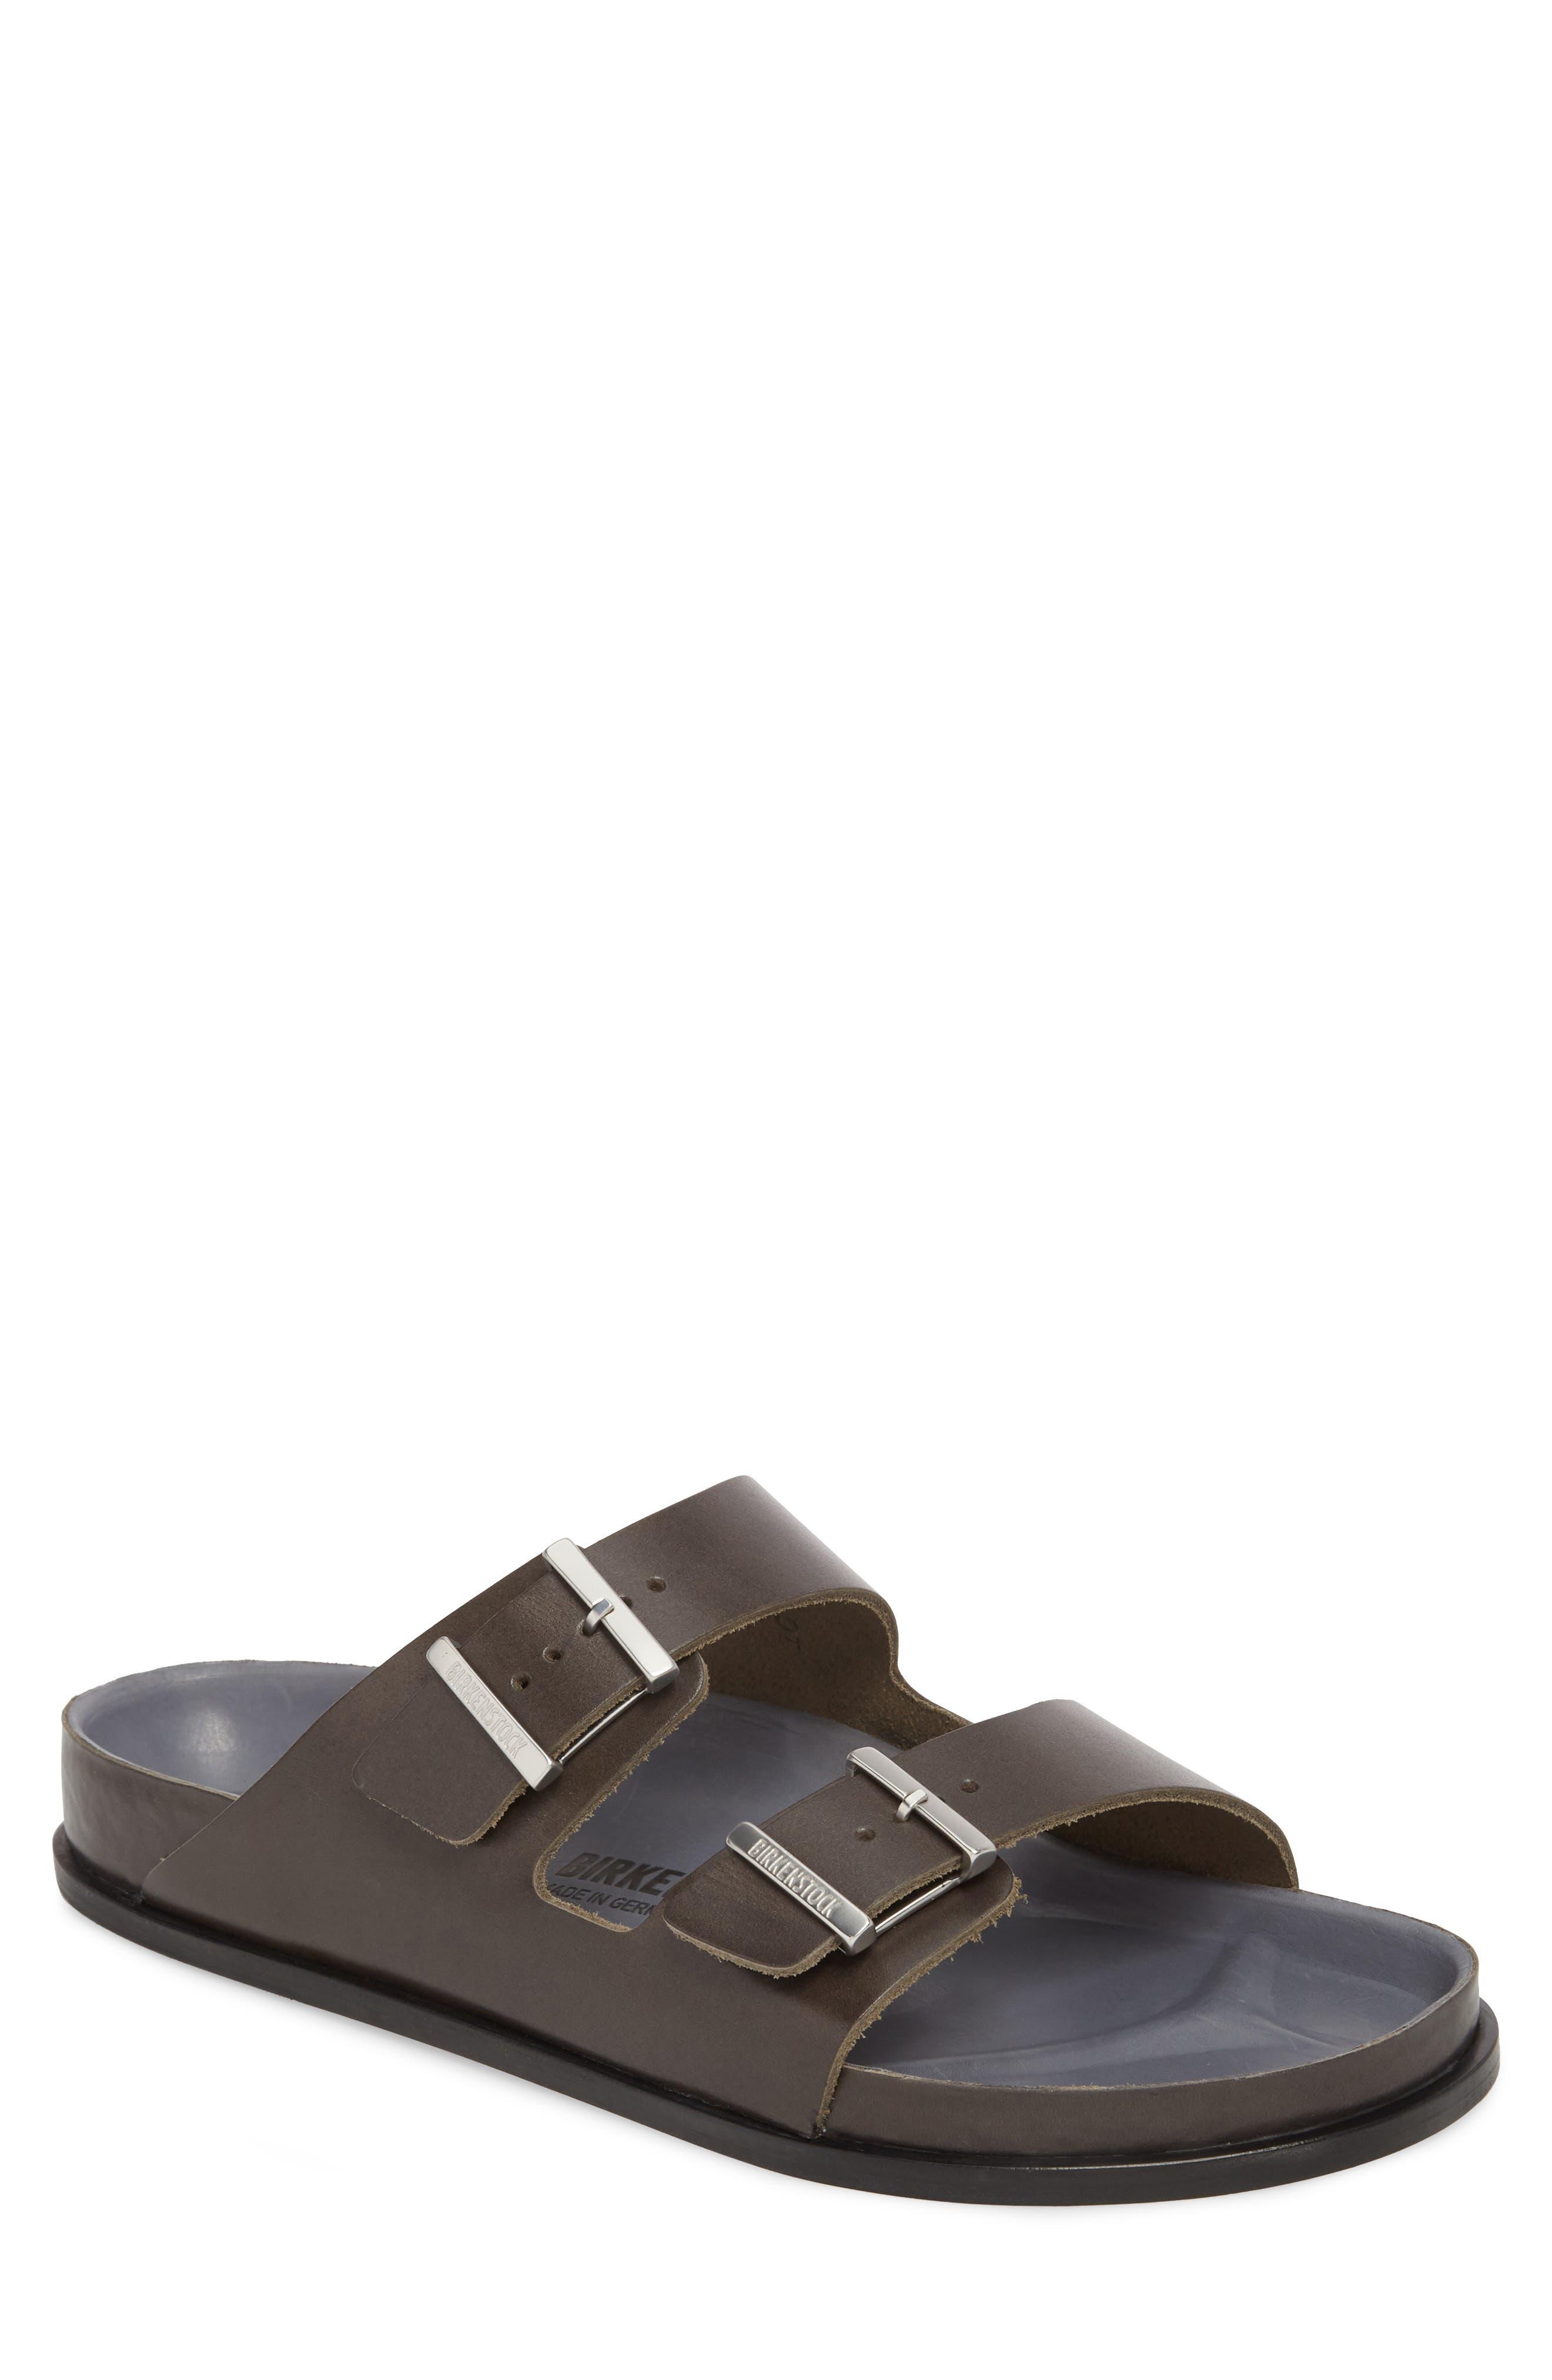 Birkenstock Arizona Premium Slide Sandal (Men)